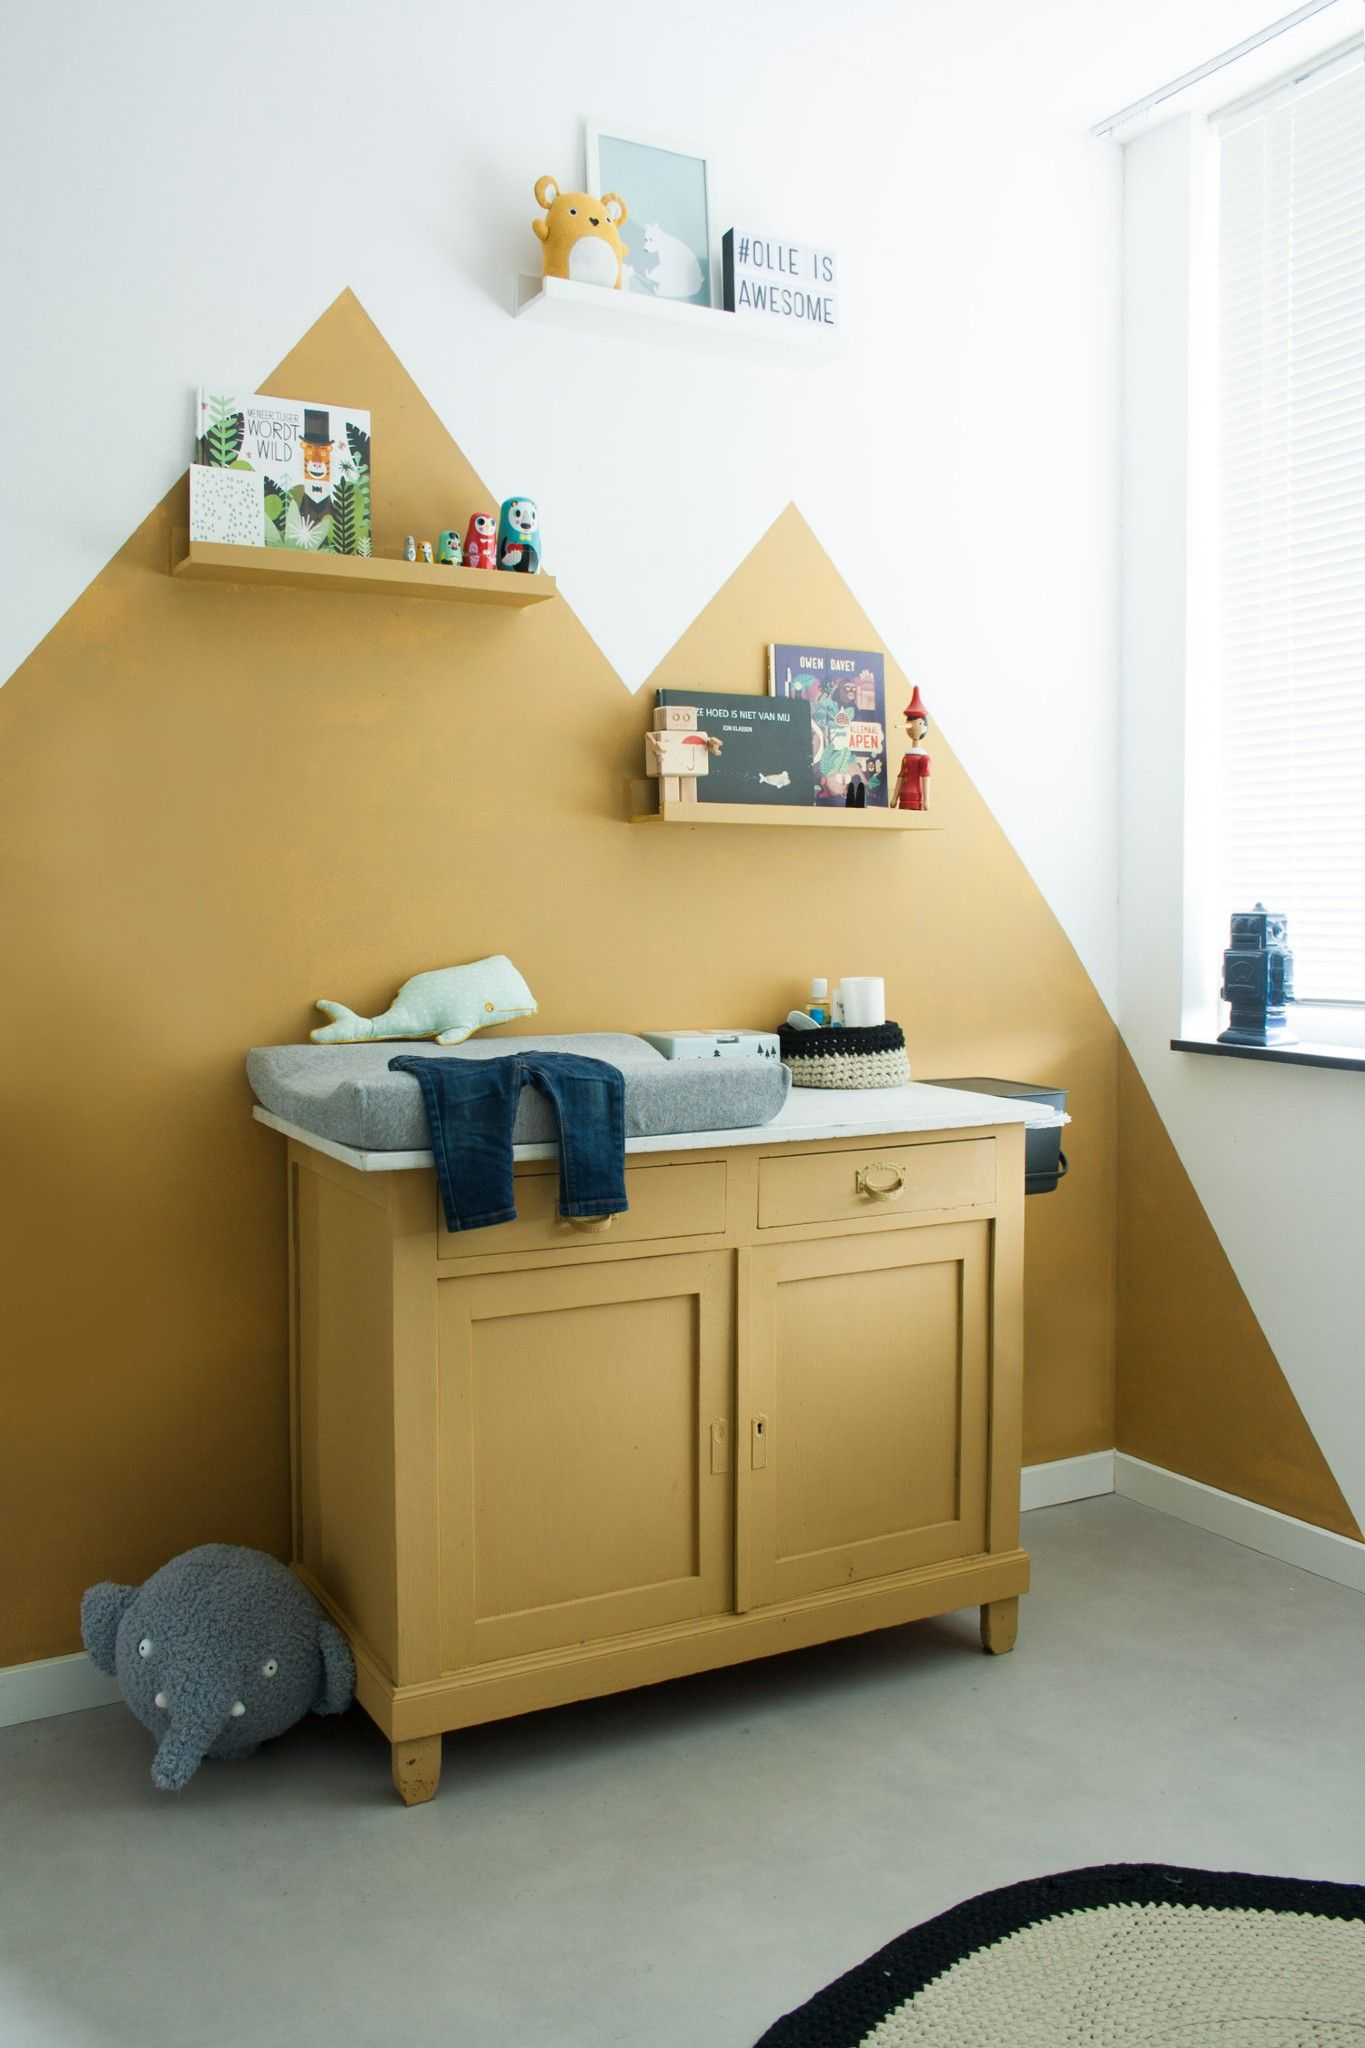 Wundervoll Kinderzimmer Farbgestaltung Dekoration Von #kinderzimmer #farbe #idee #inspiration #neutral >>okergoud